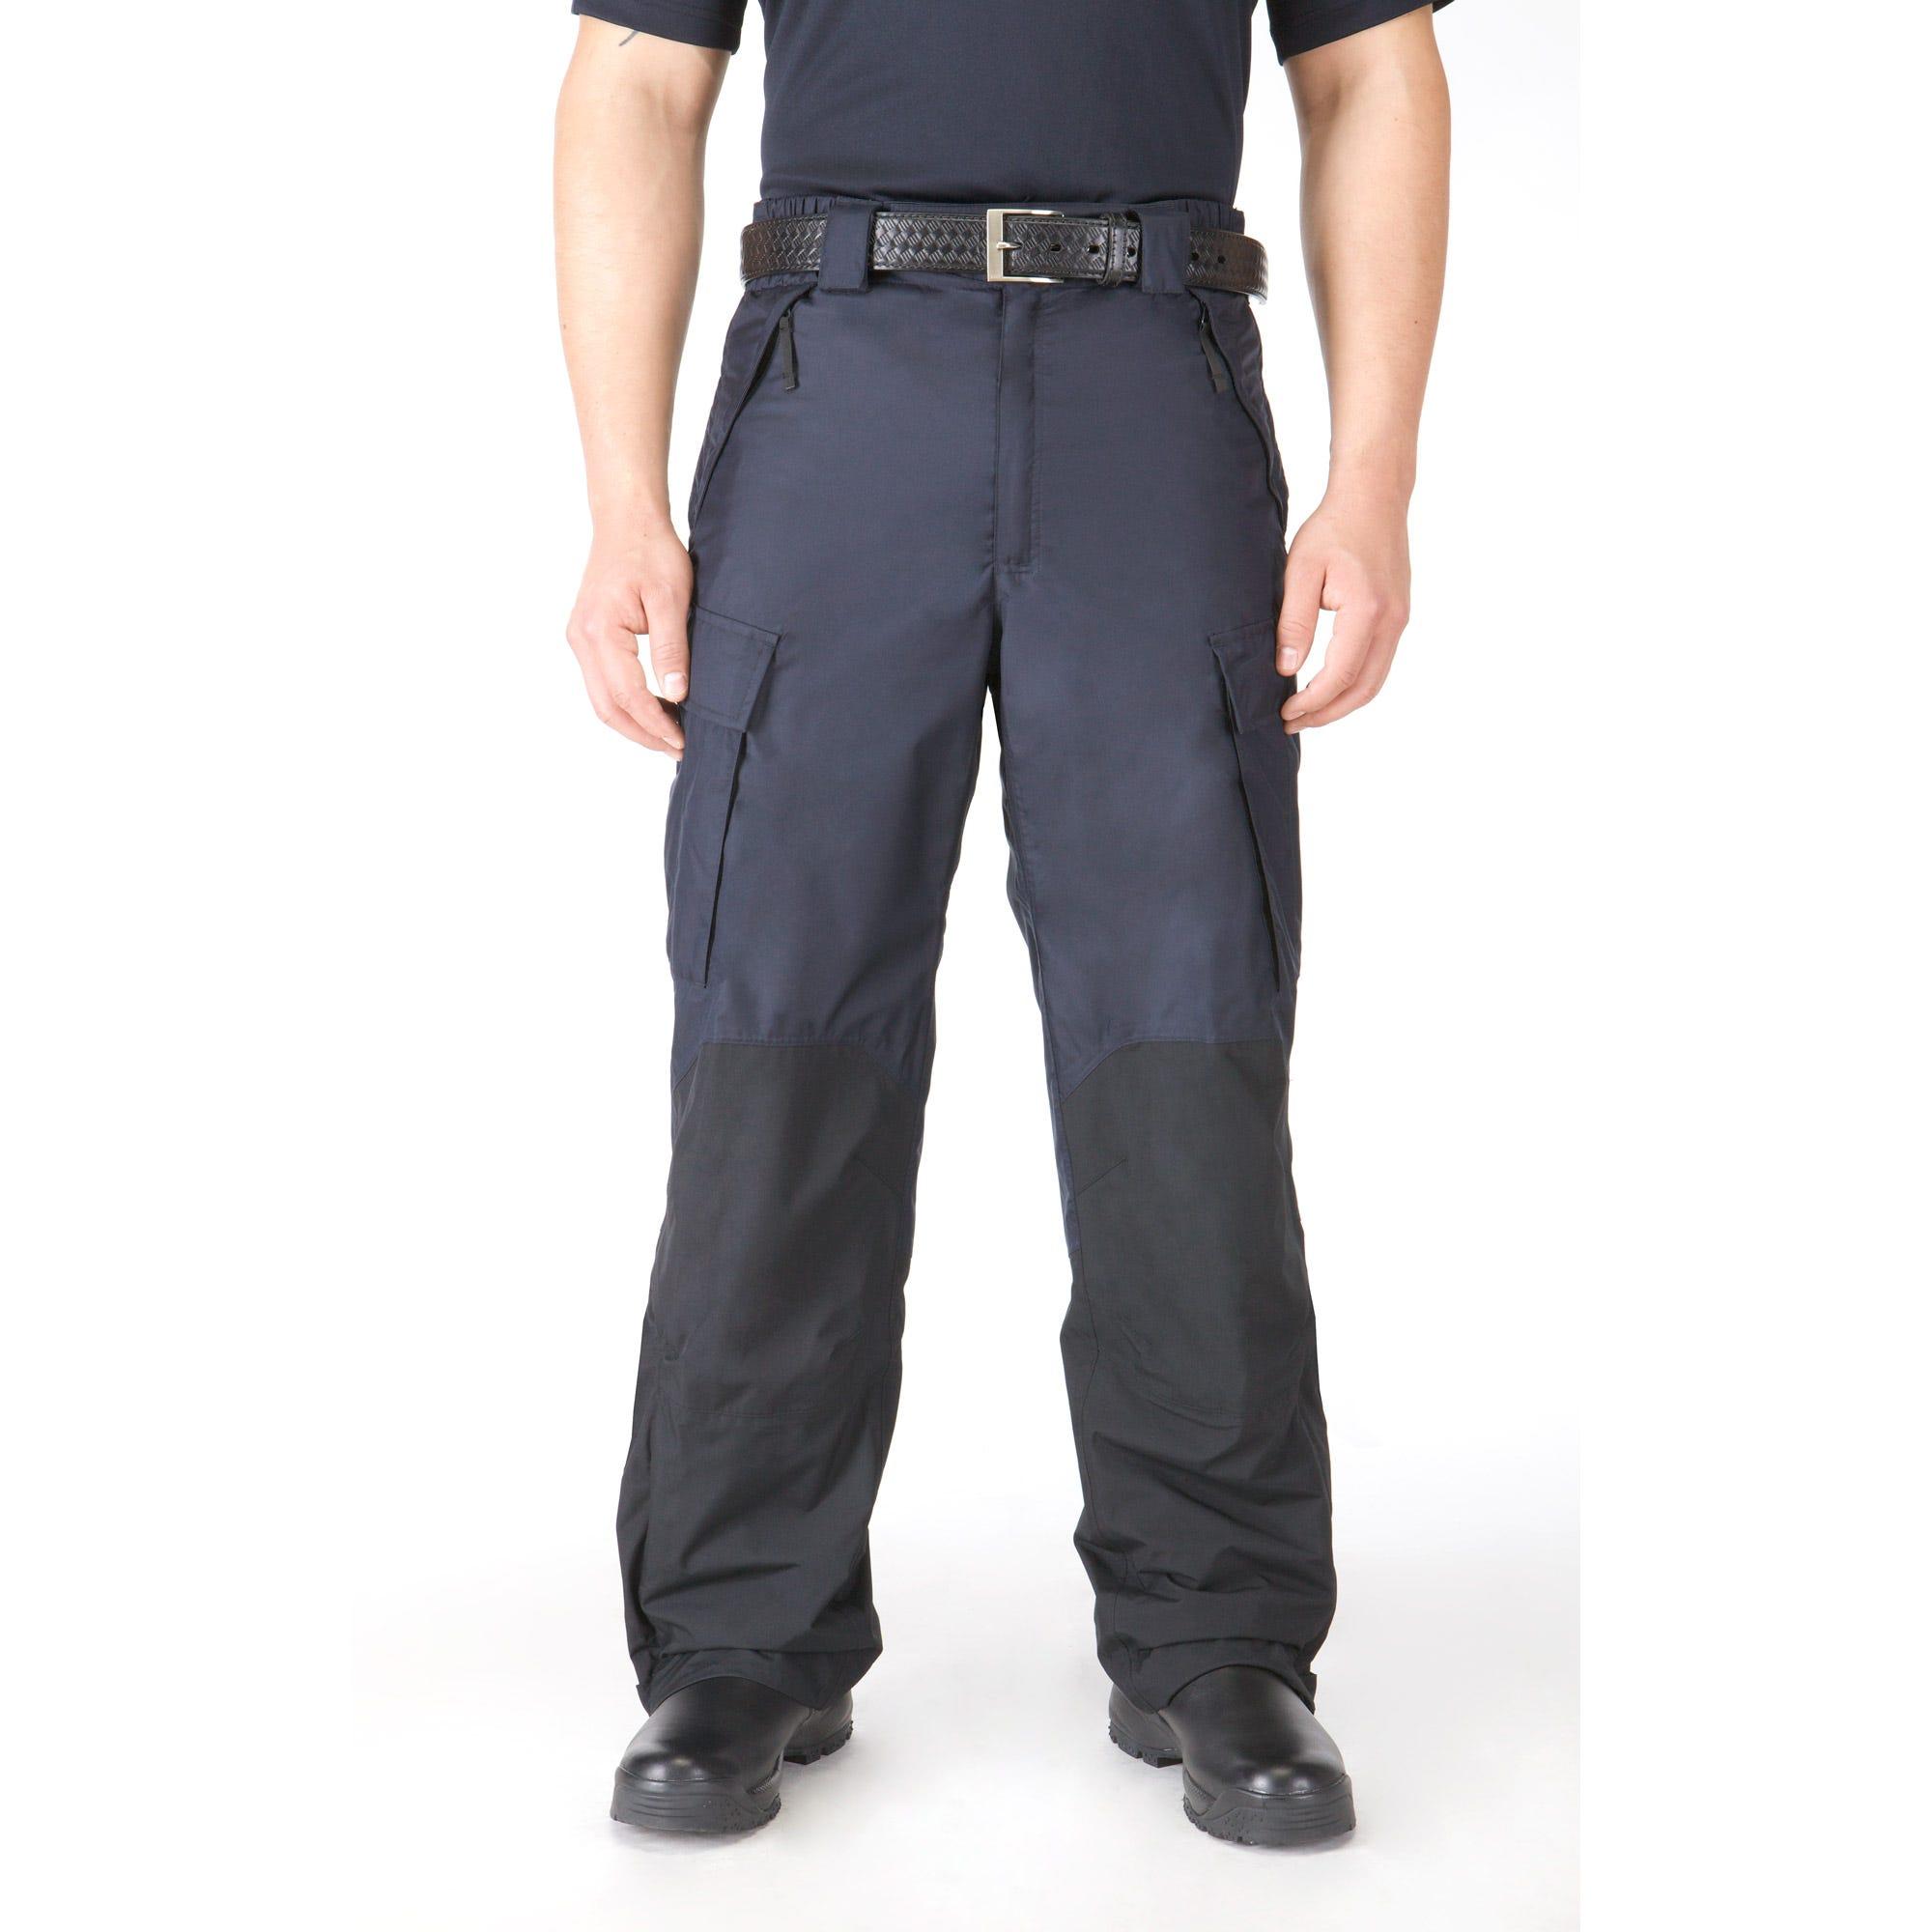 5.11 Tactical Men's Patrol Rain Pant (Blue)